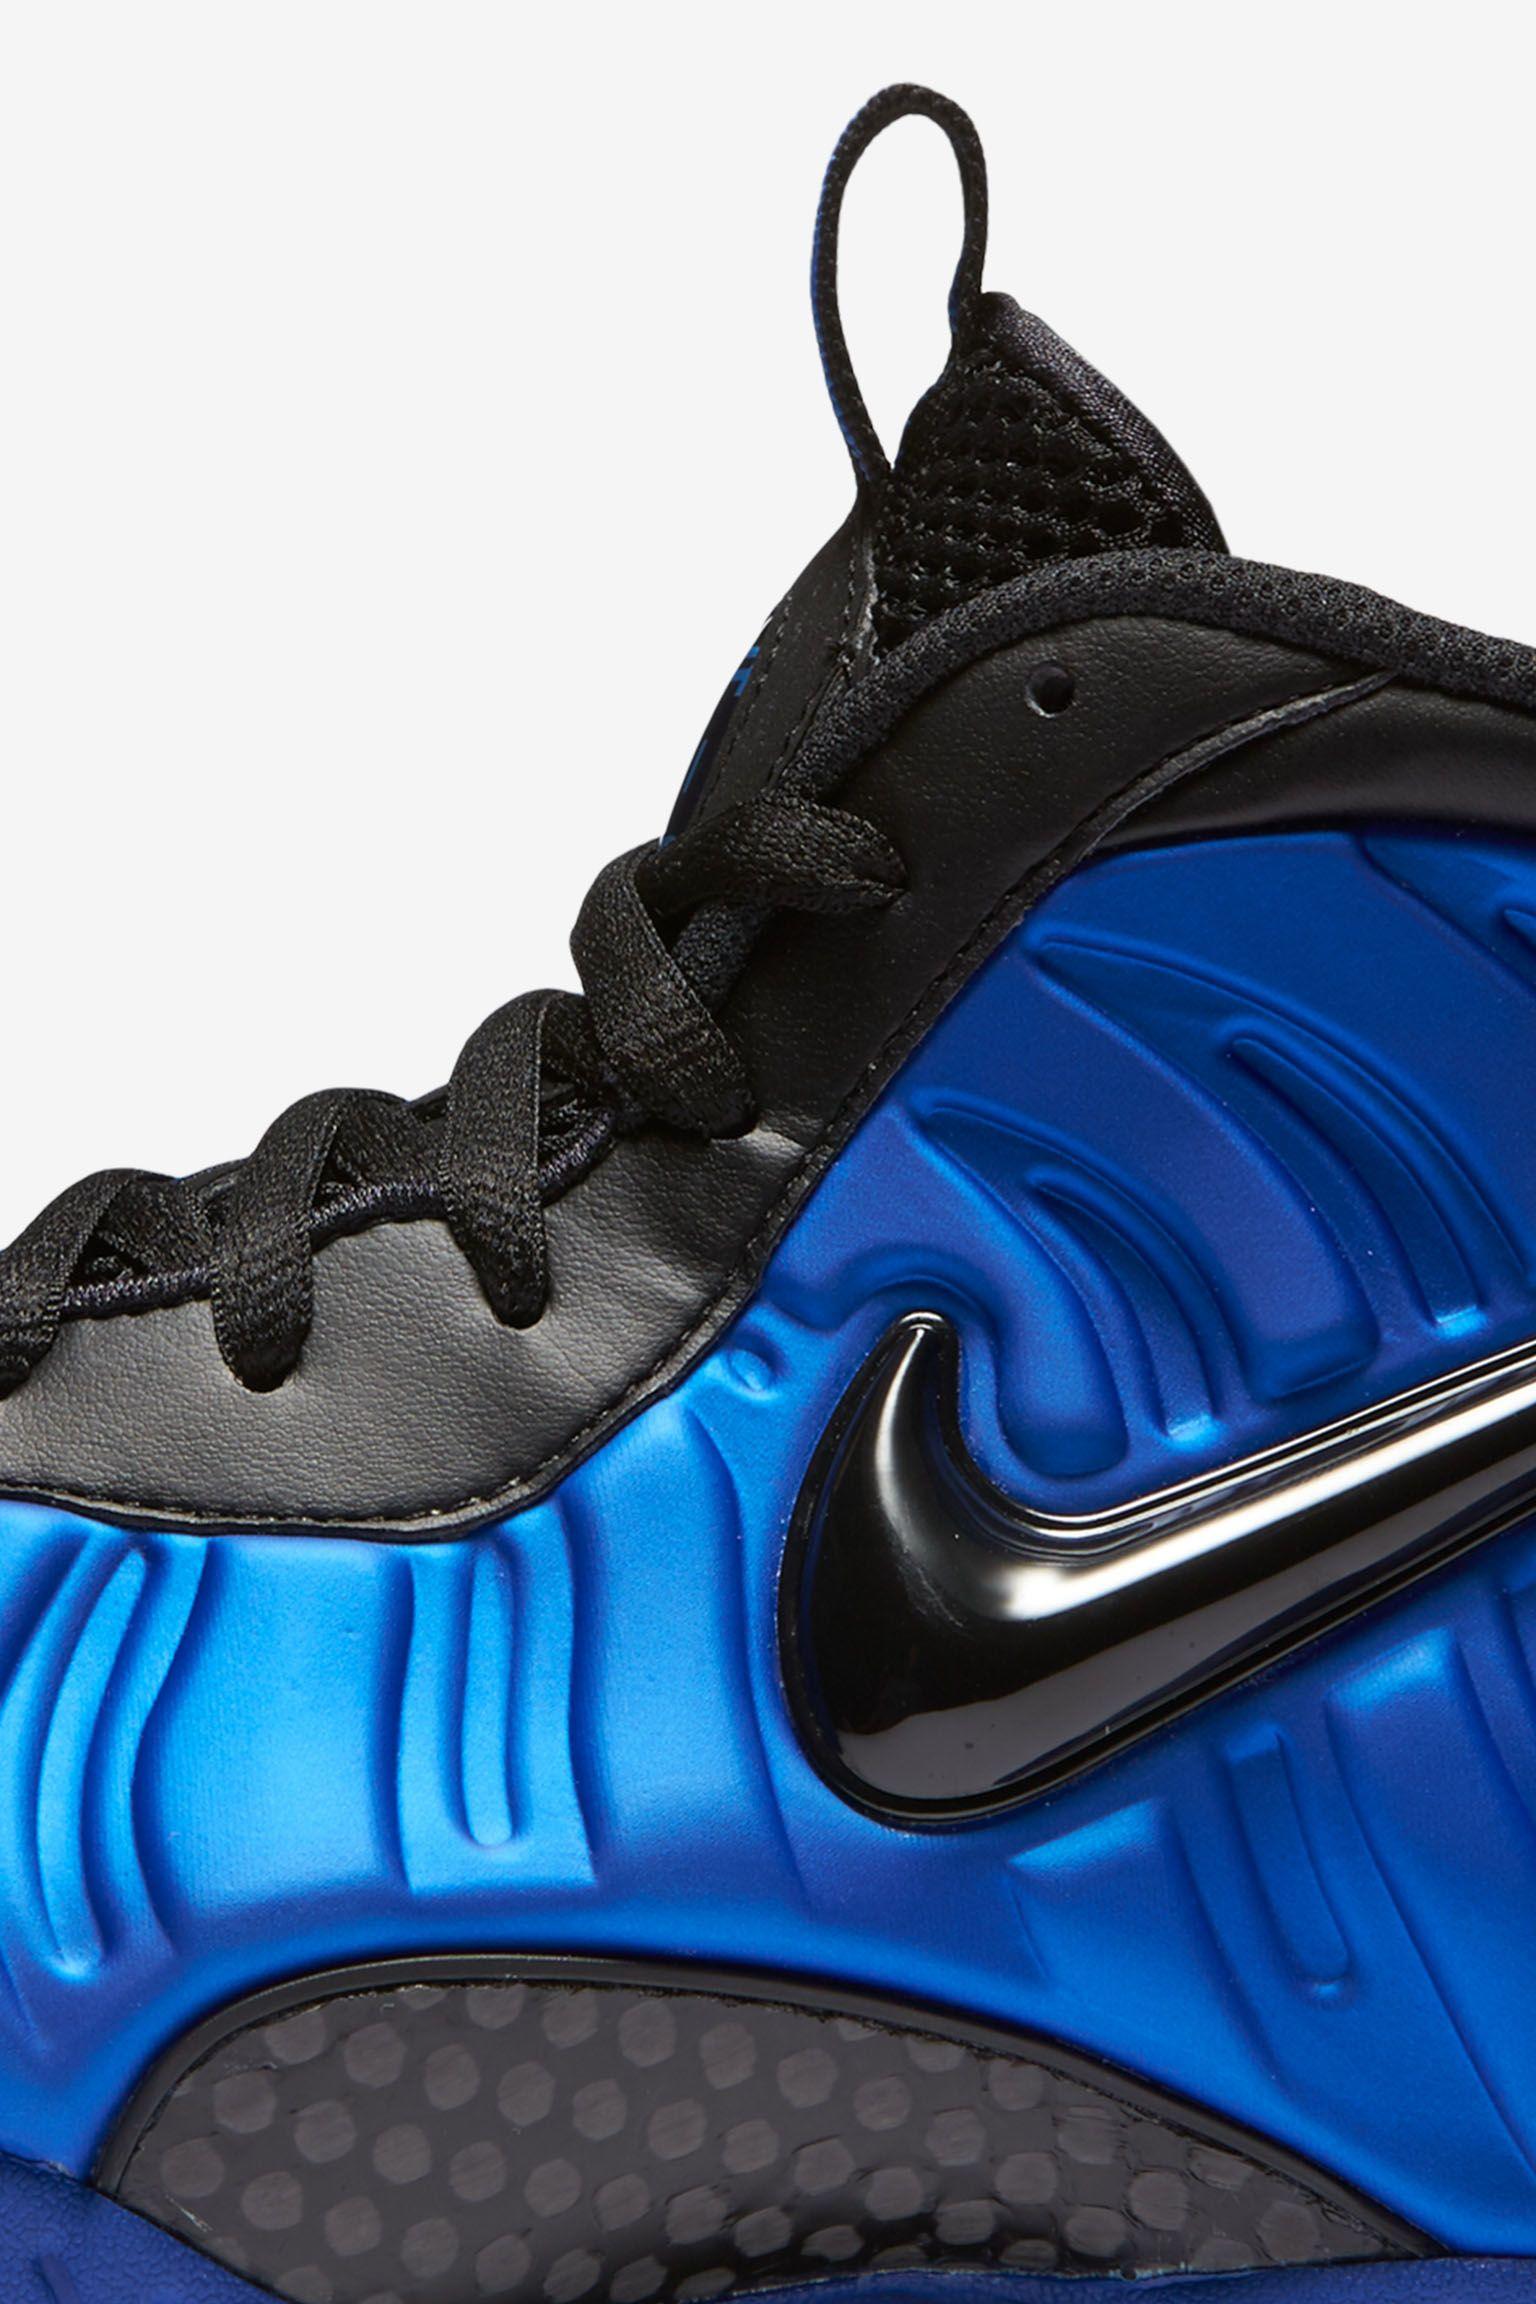 Nike Air Foamposite Pro 'Hyper Cobalt' Release Date